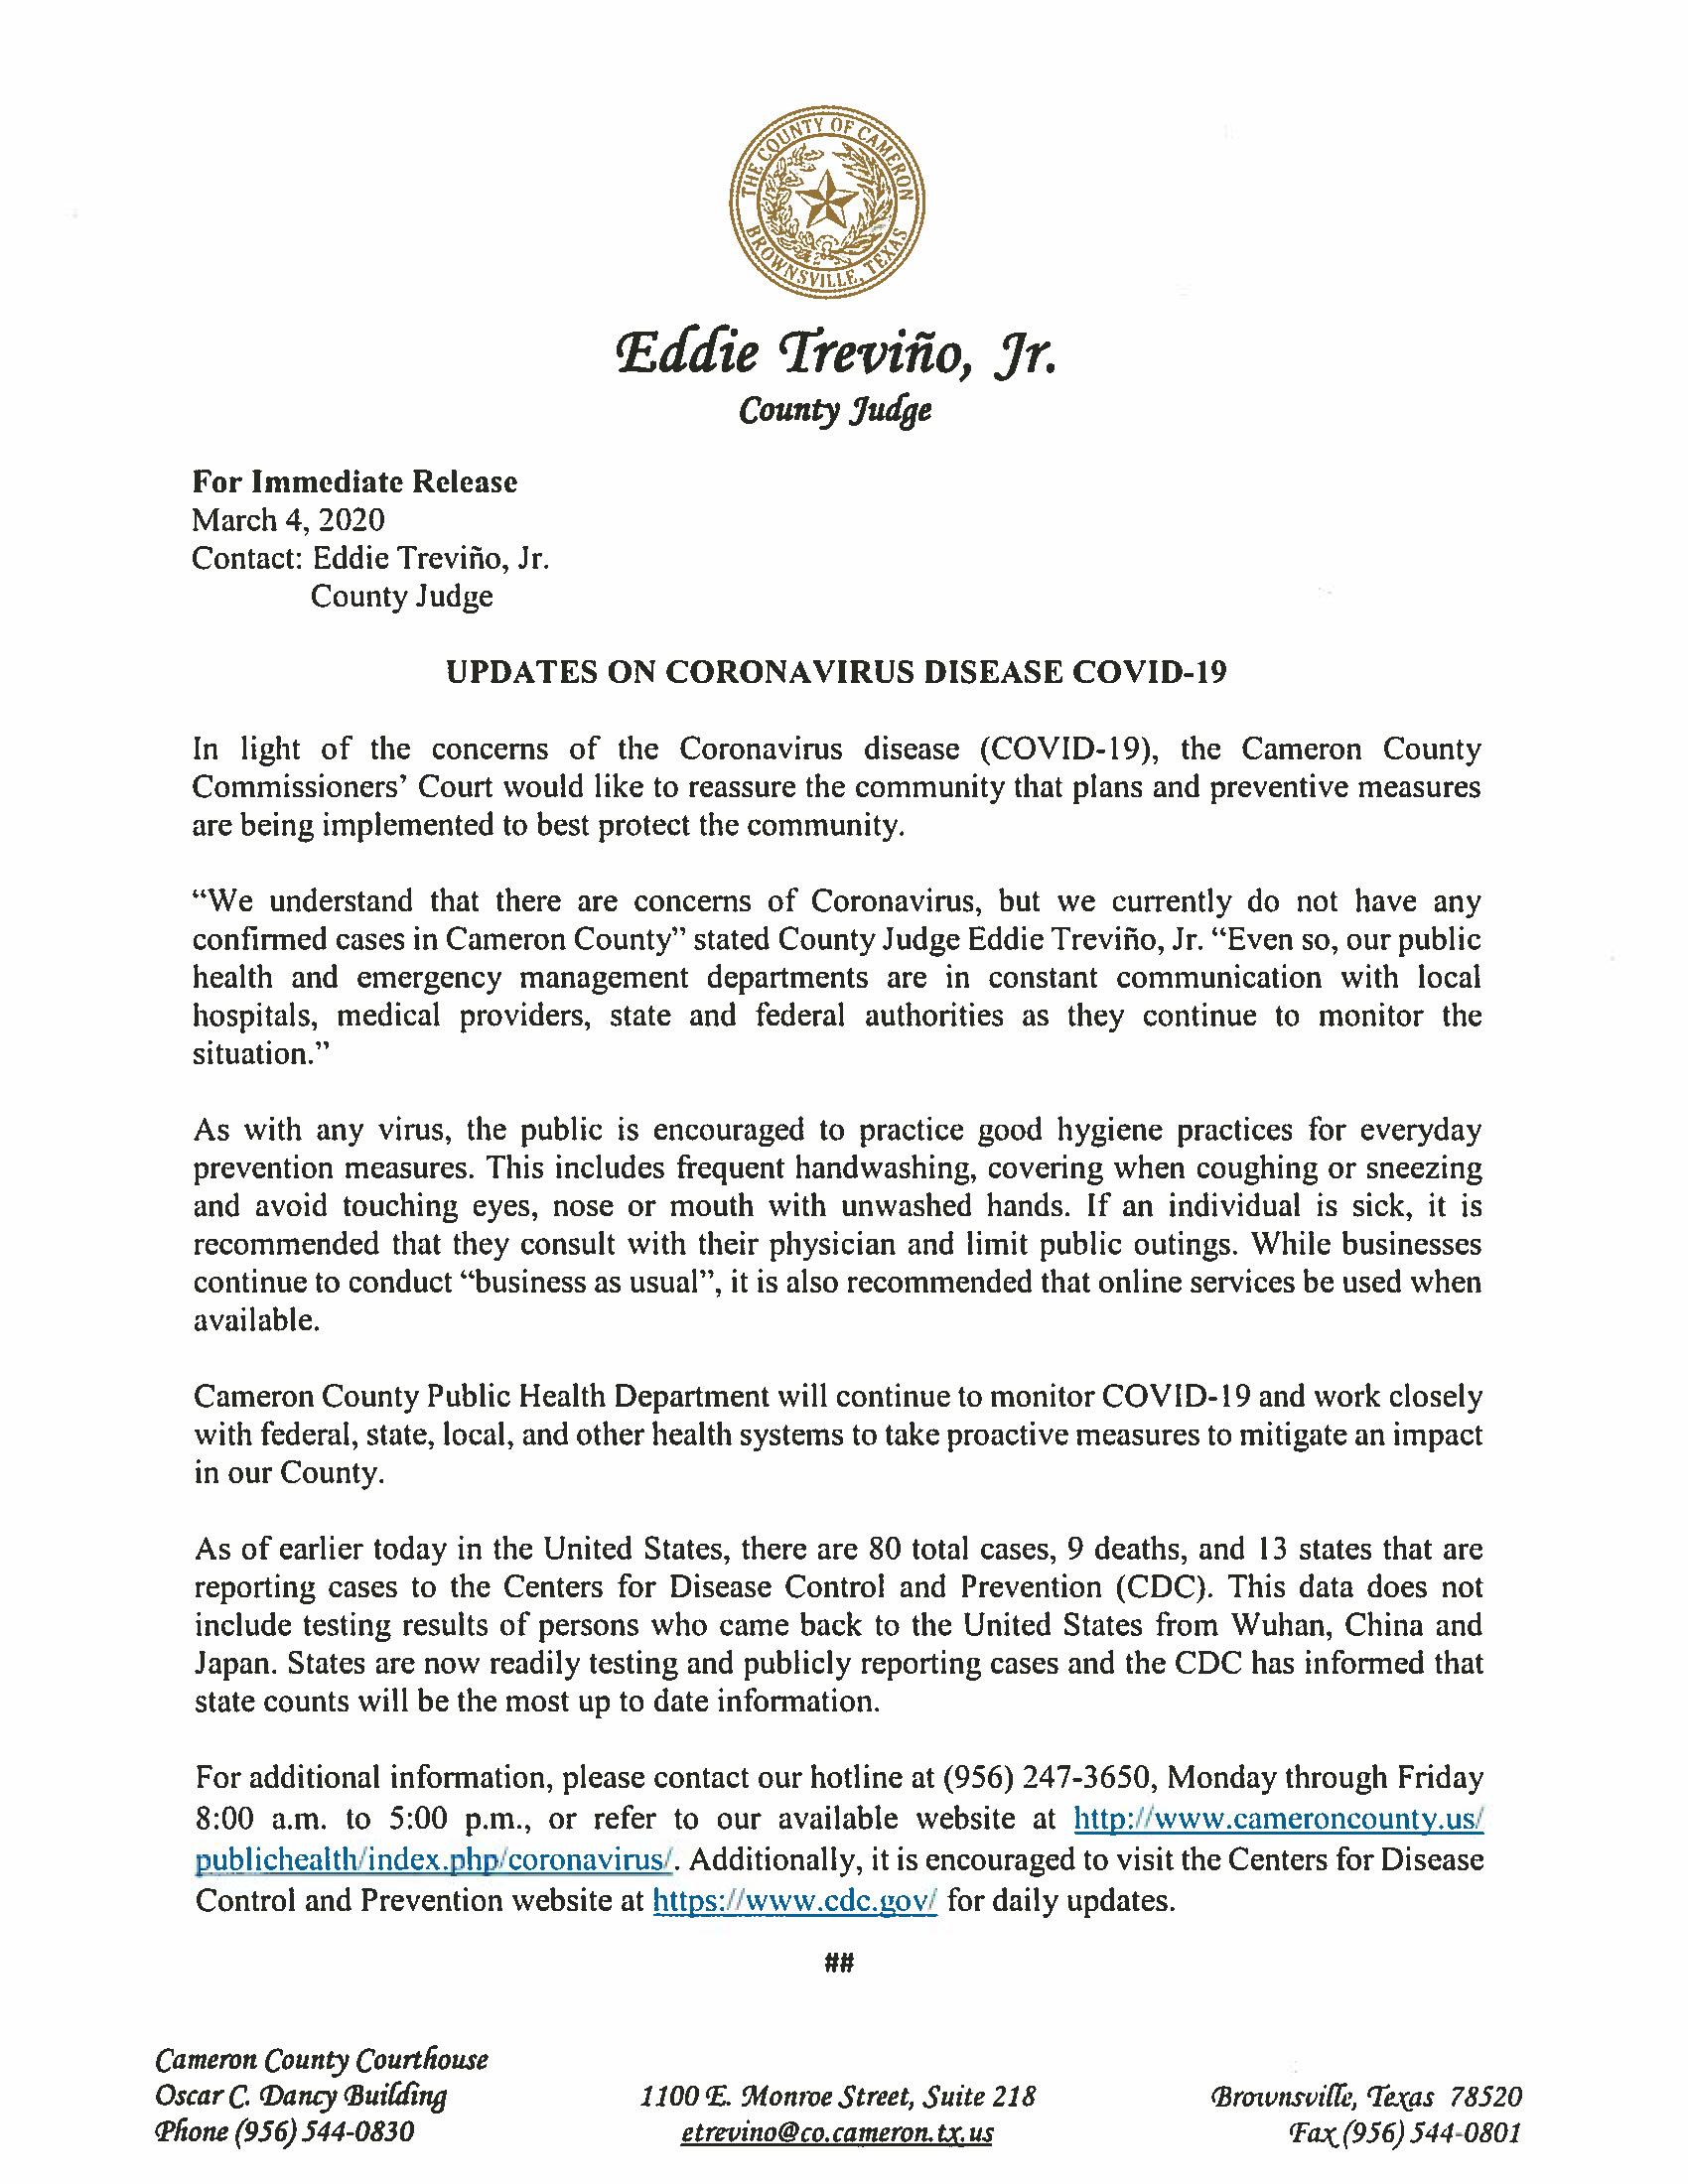 03.04.2020 Press Release Updates On Coronavirus Disease COVID 19